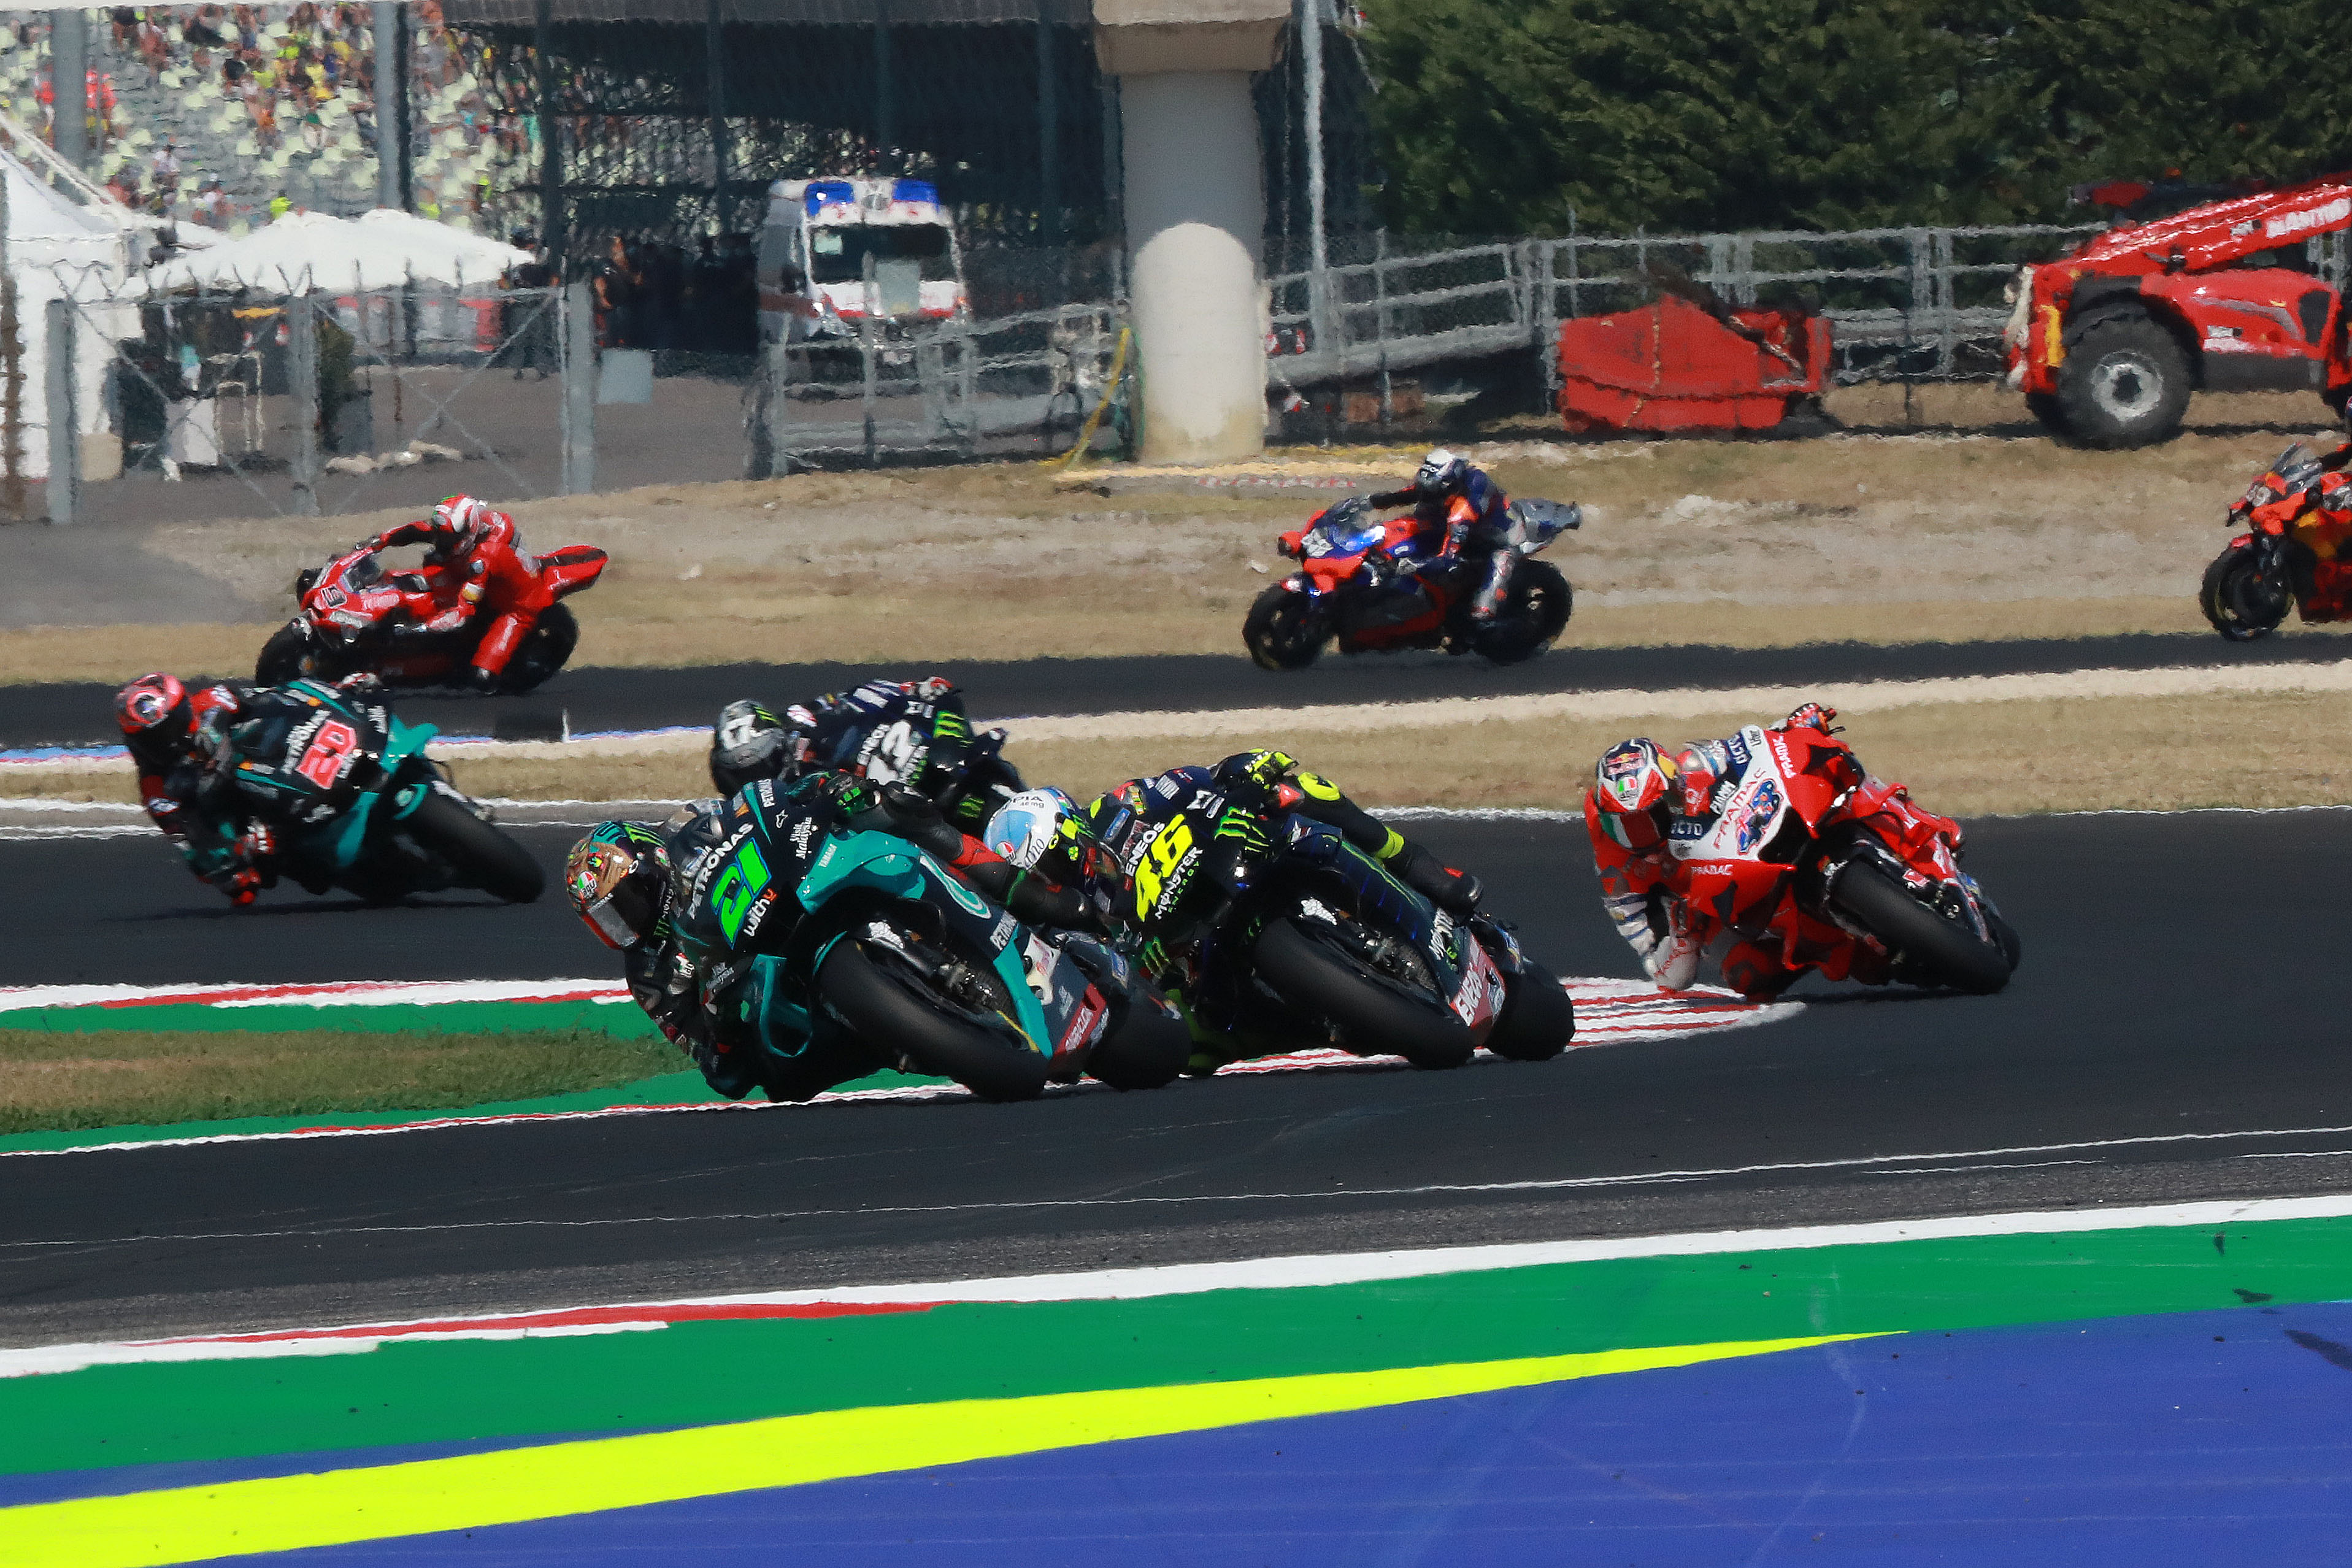 Misano MotoGP 2020